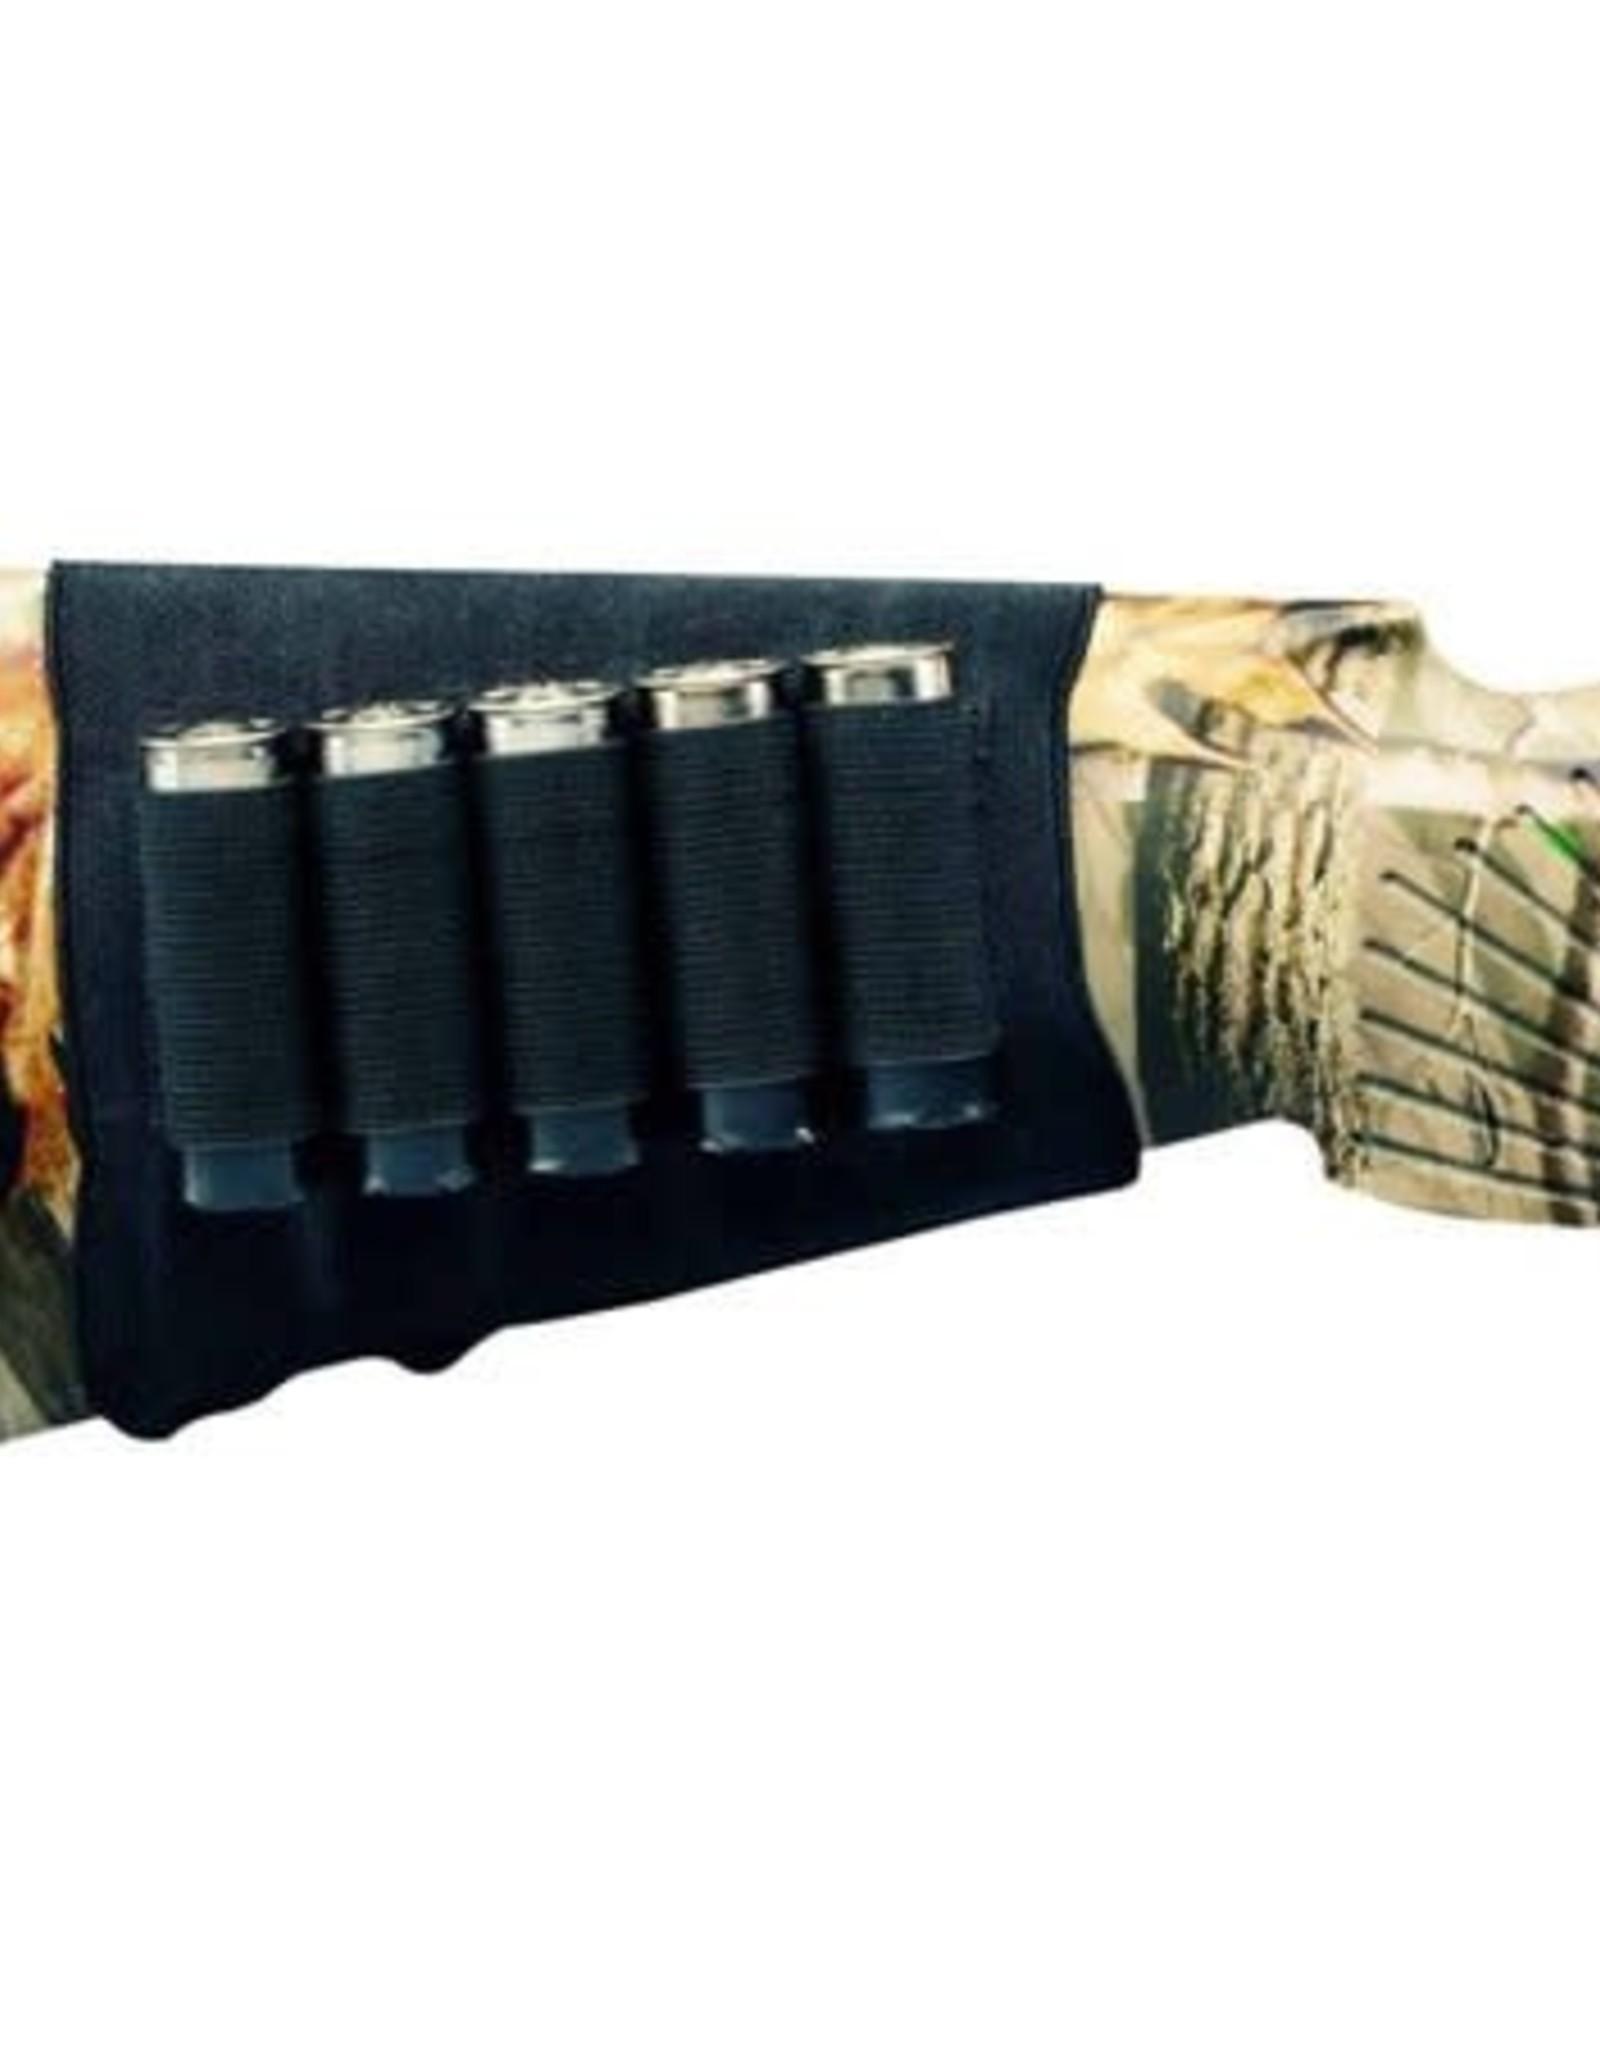 Hunters Specialties Butt Stock Rifle Shell Holder